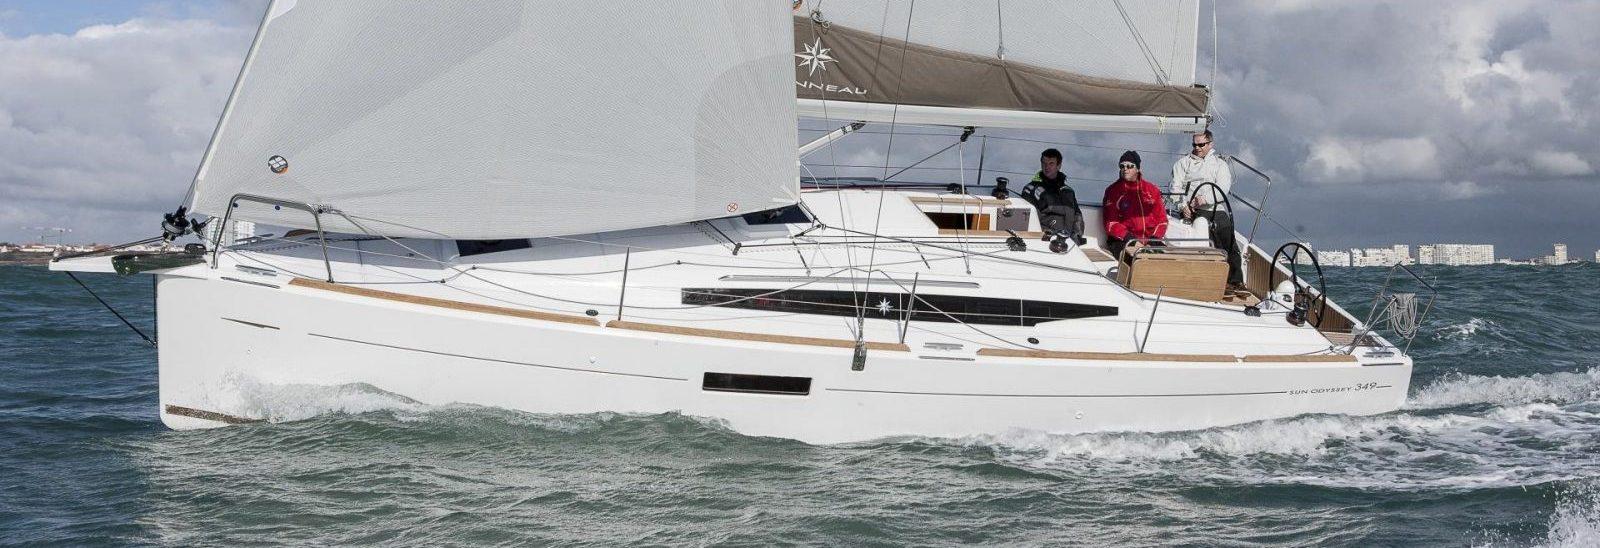 Jeanneau 349 Sun Odyssey sailing charter